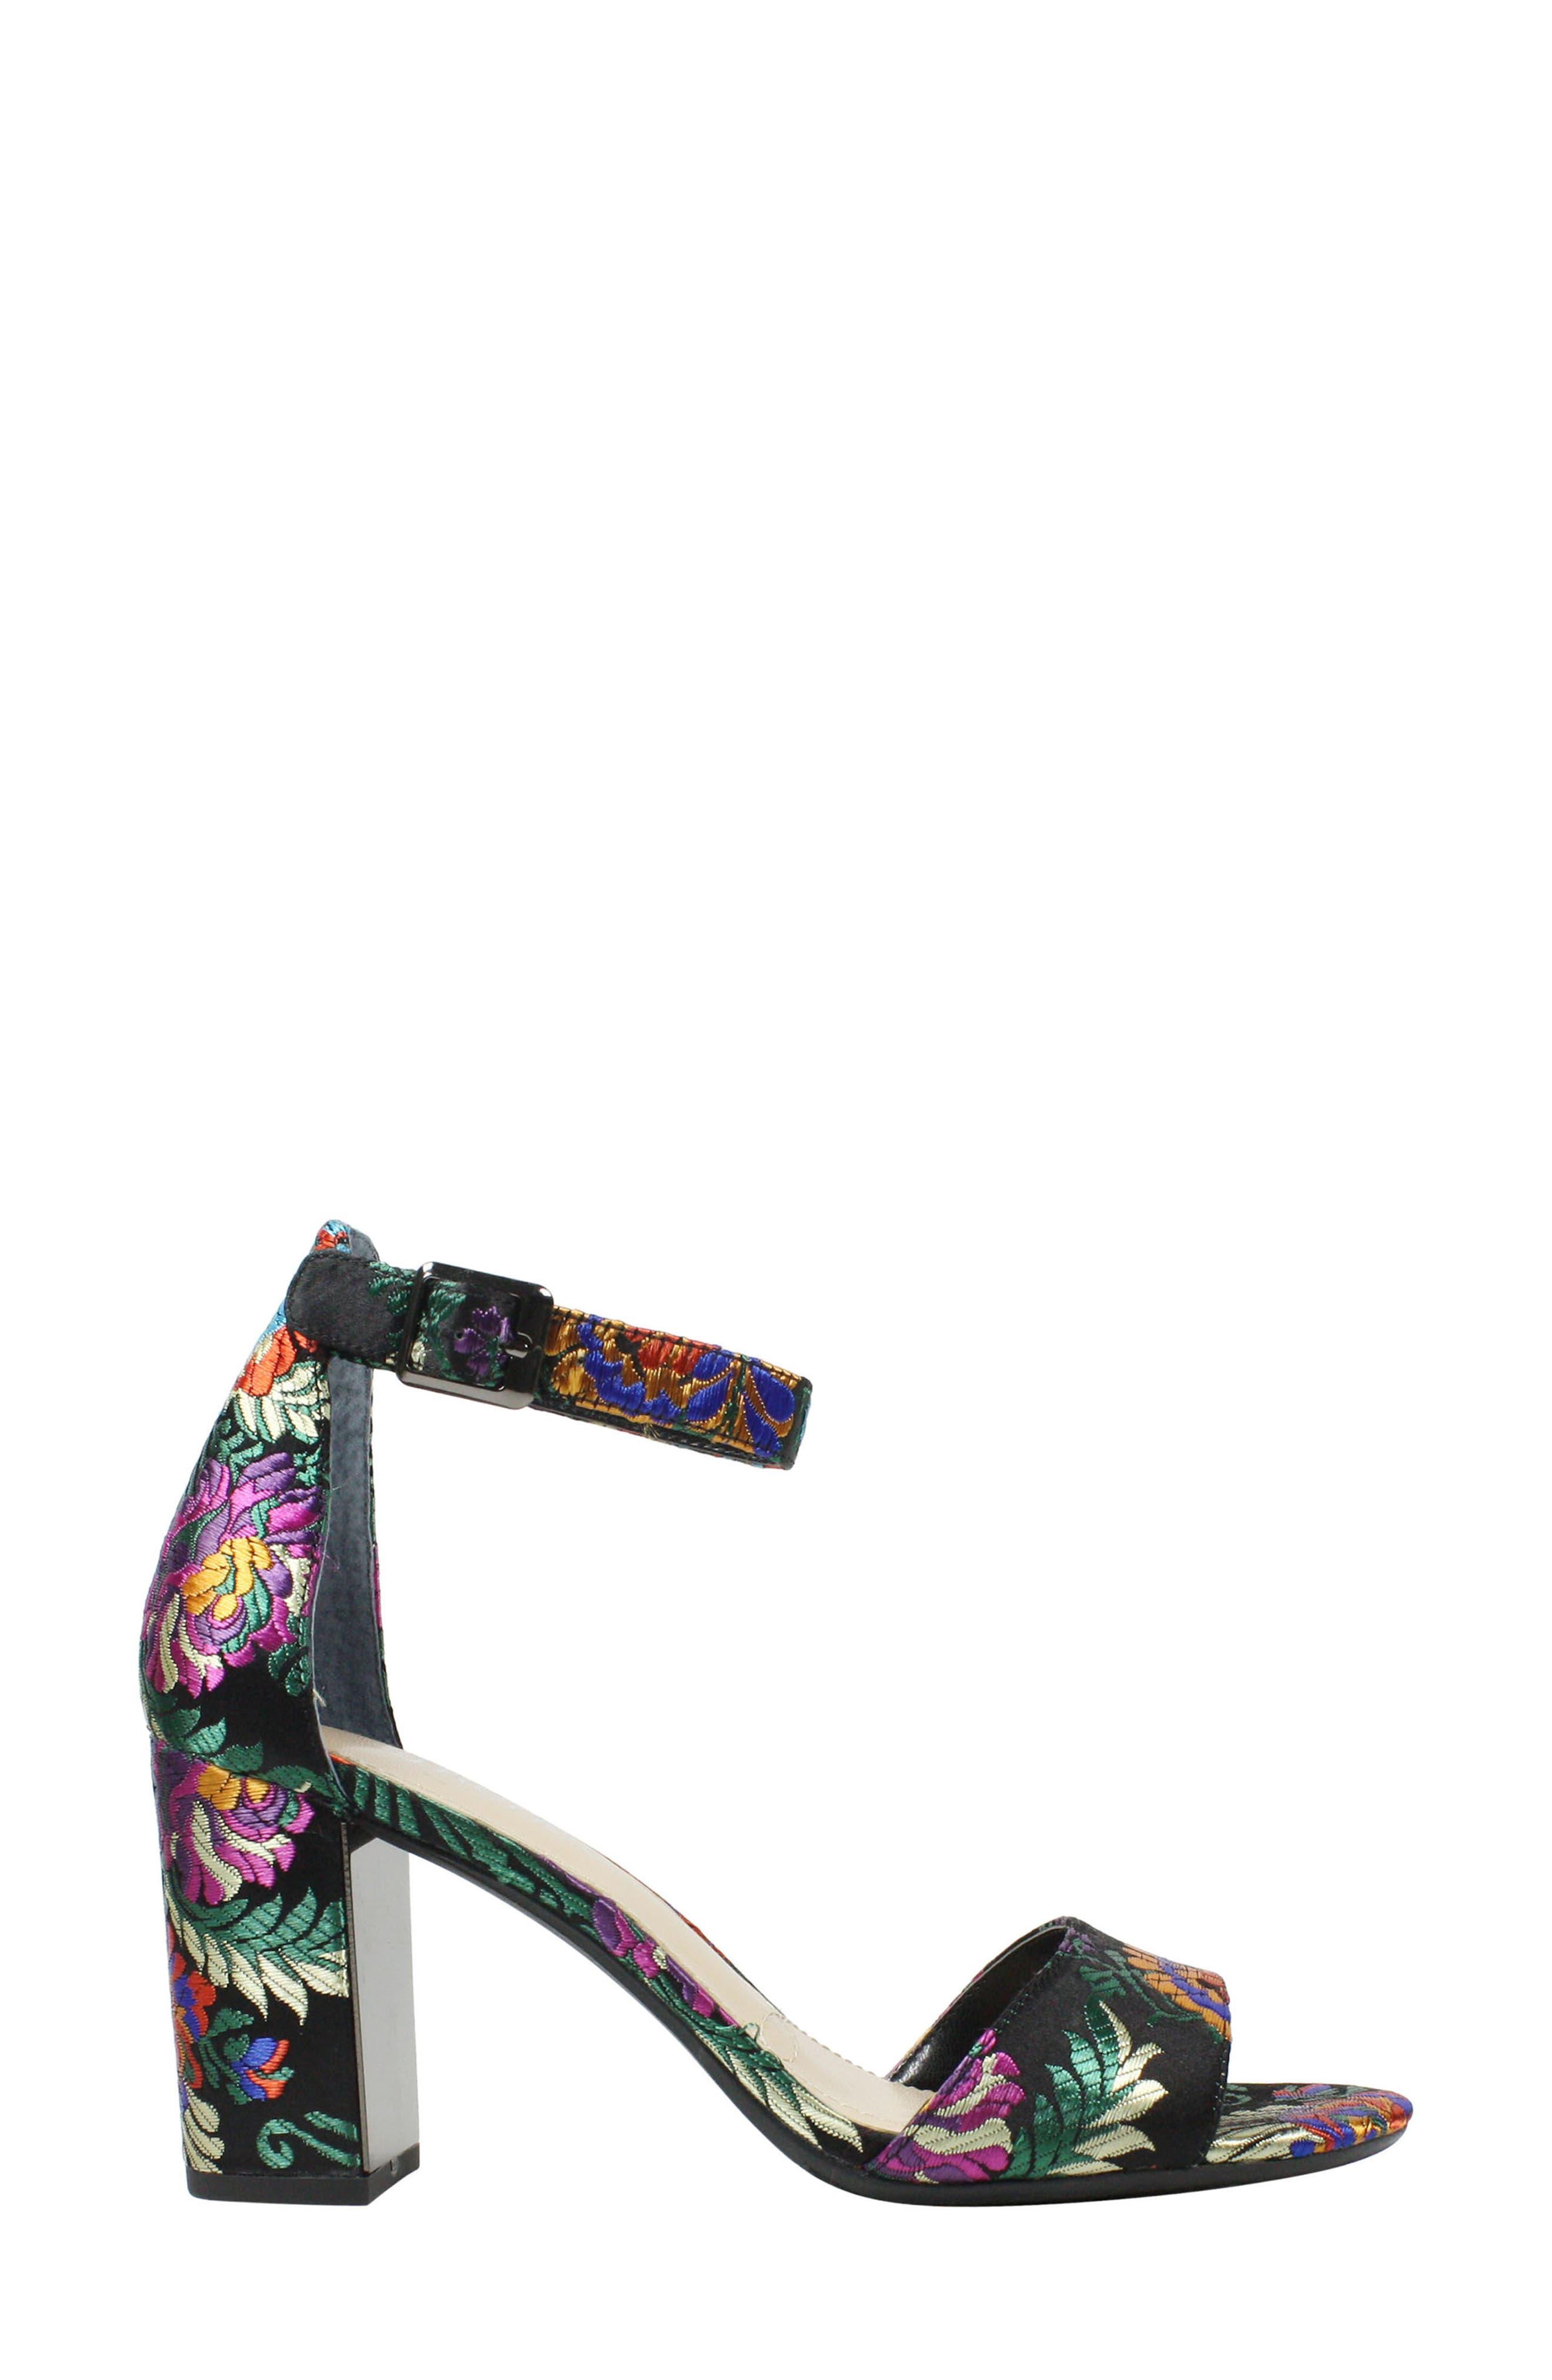 Flaviana Ankle Strap Sandal,                             Alternate thumbnail 3, color,                             BLACK MULTI FABRIC